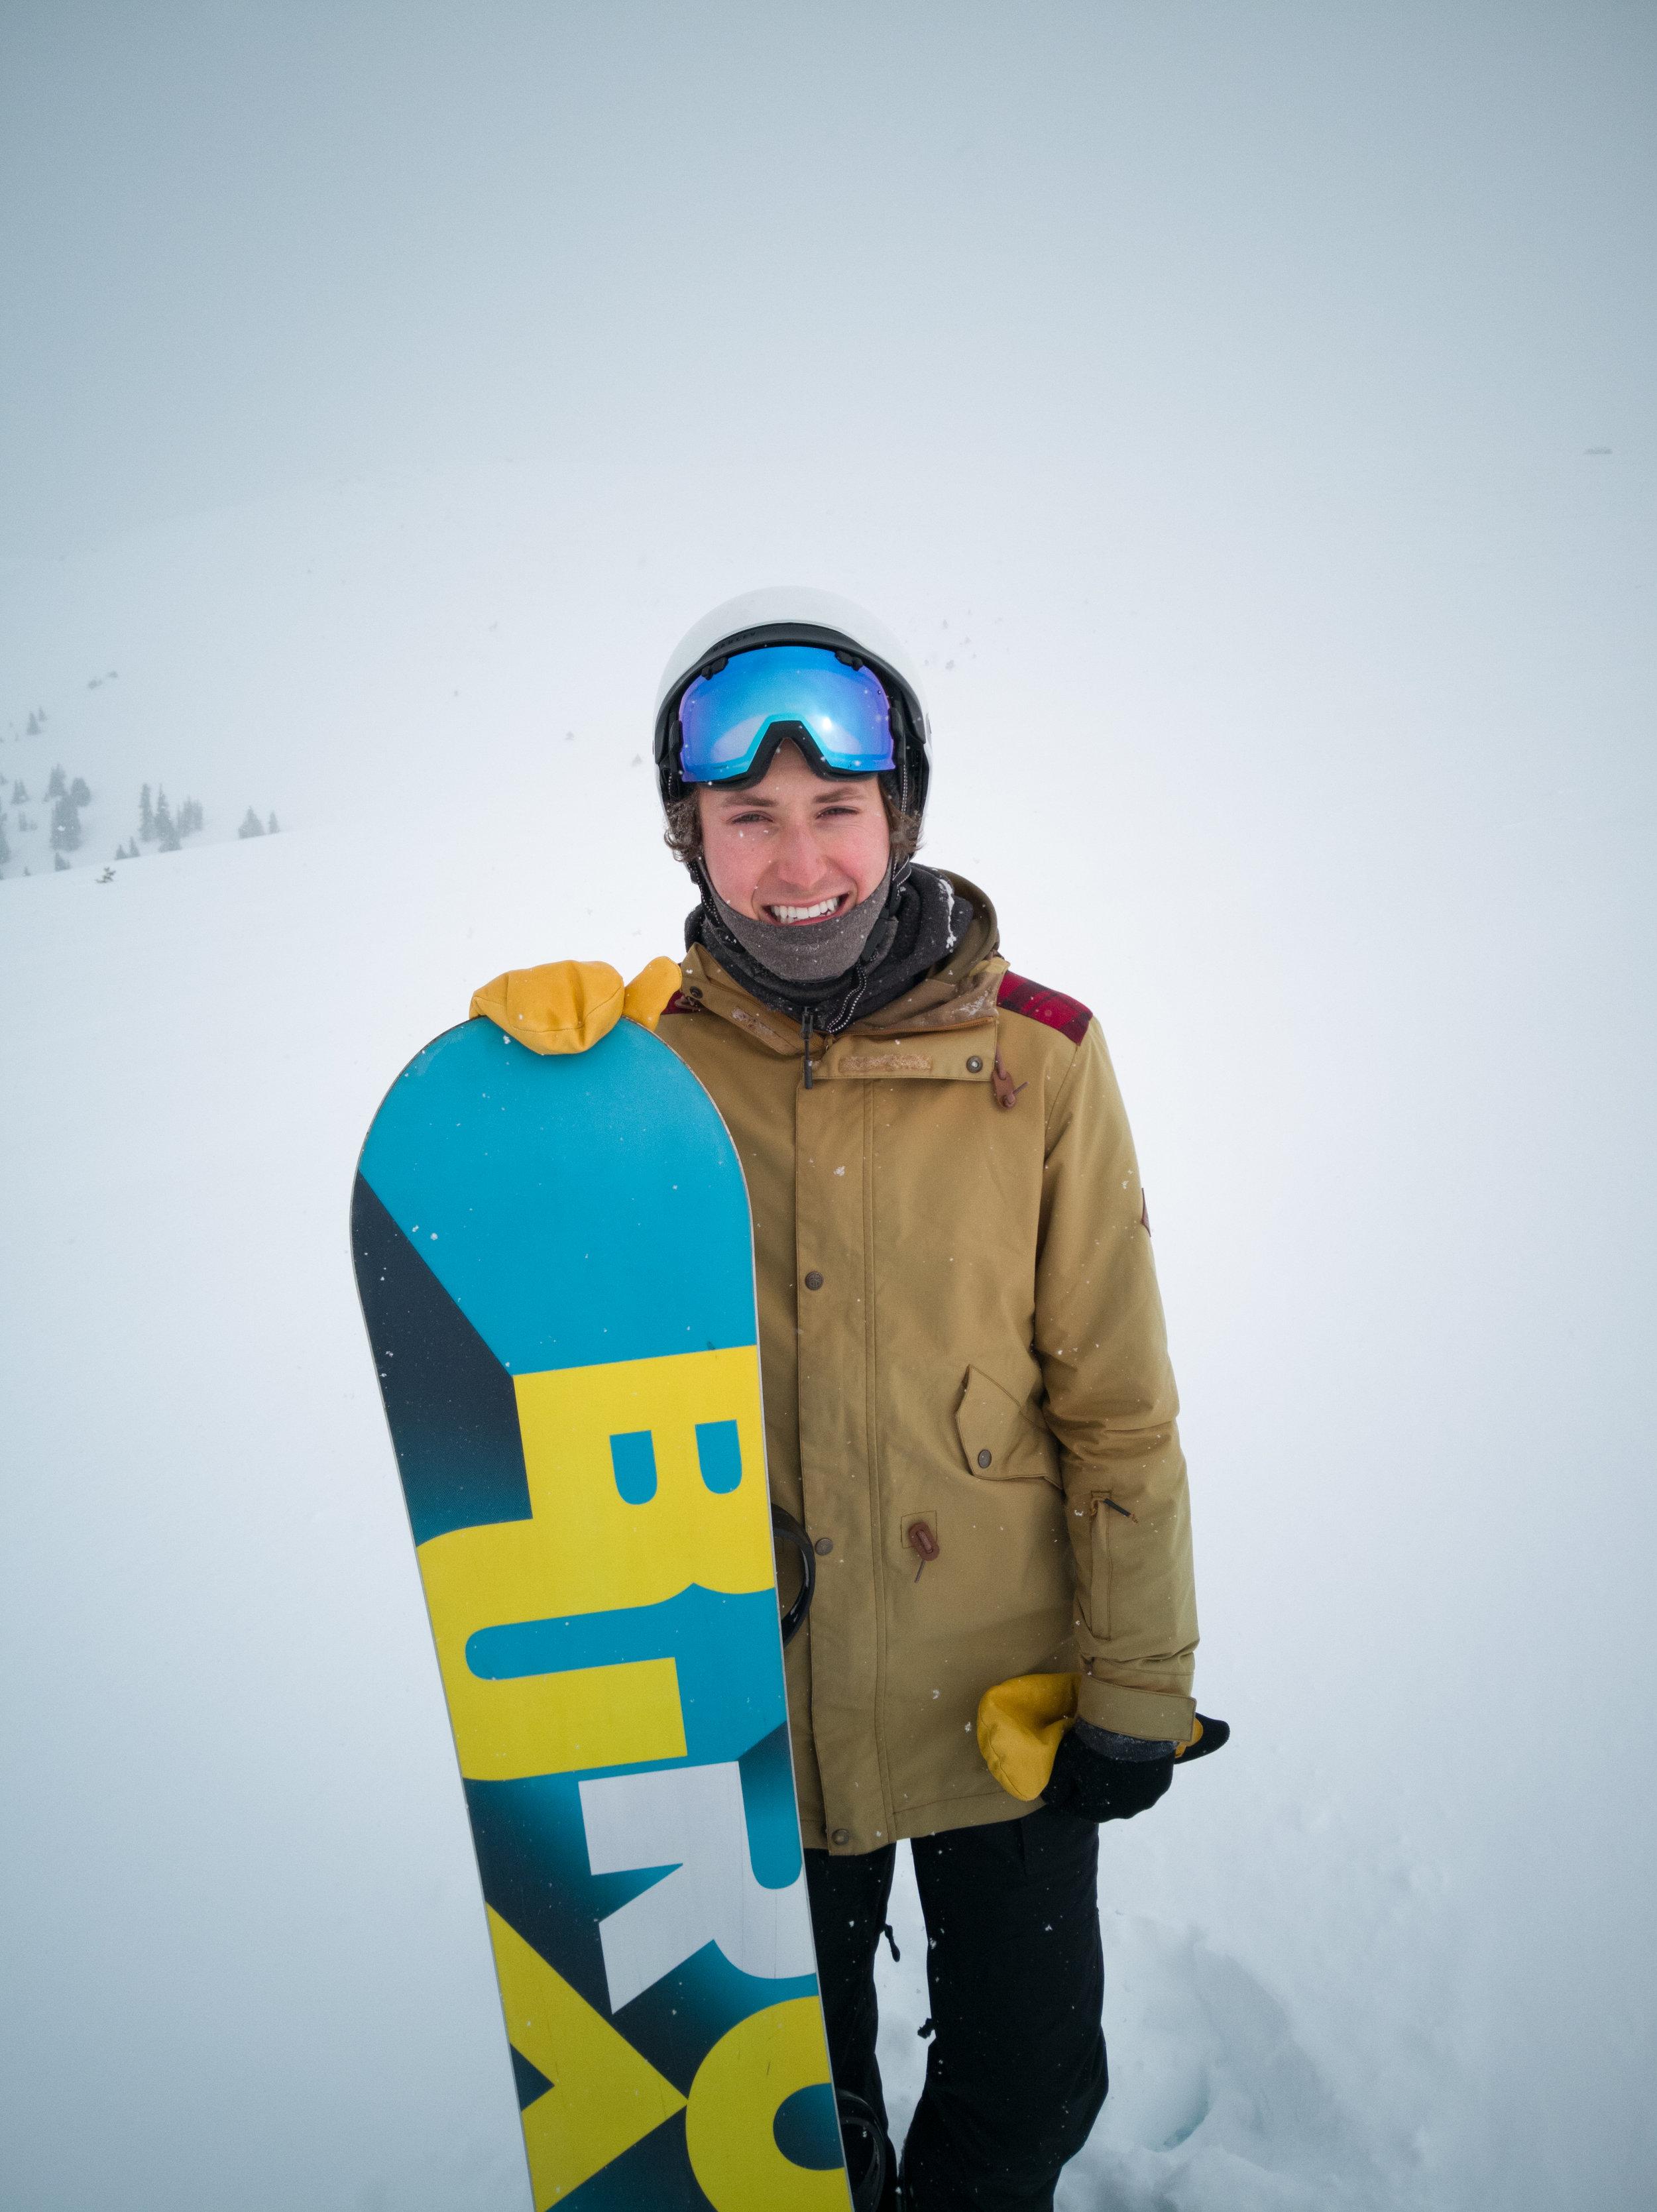 snowboarding-124051-2.jpg